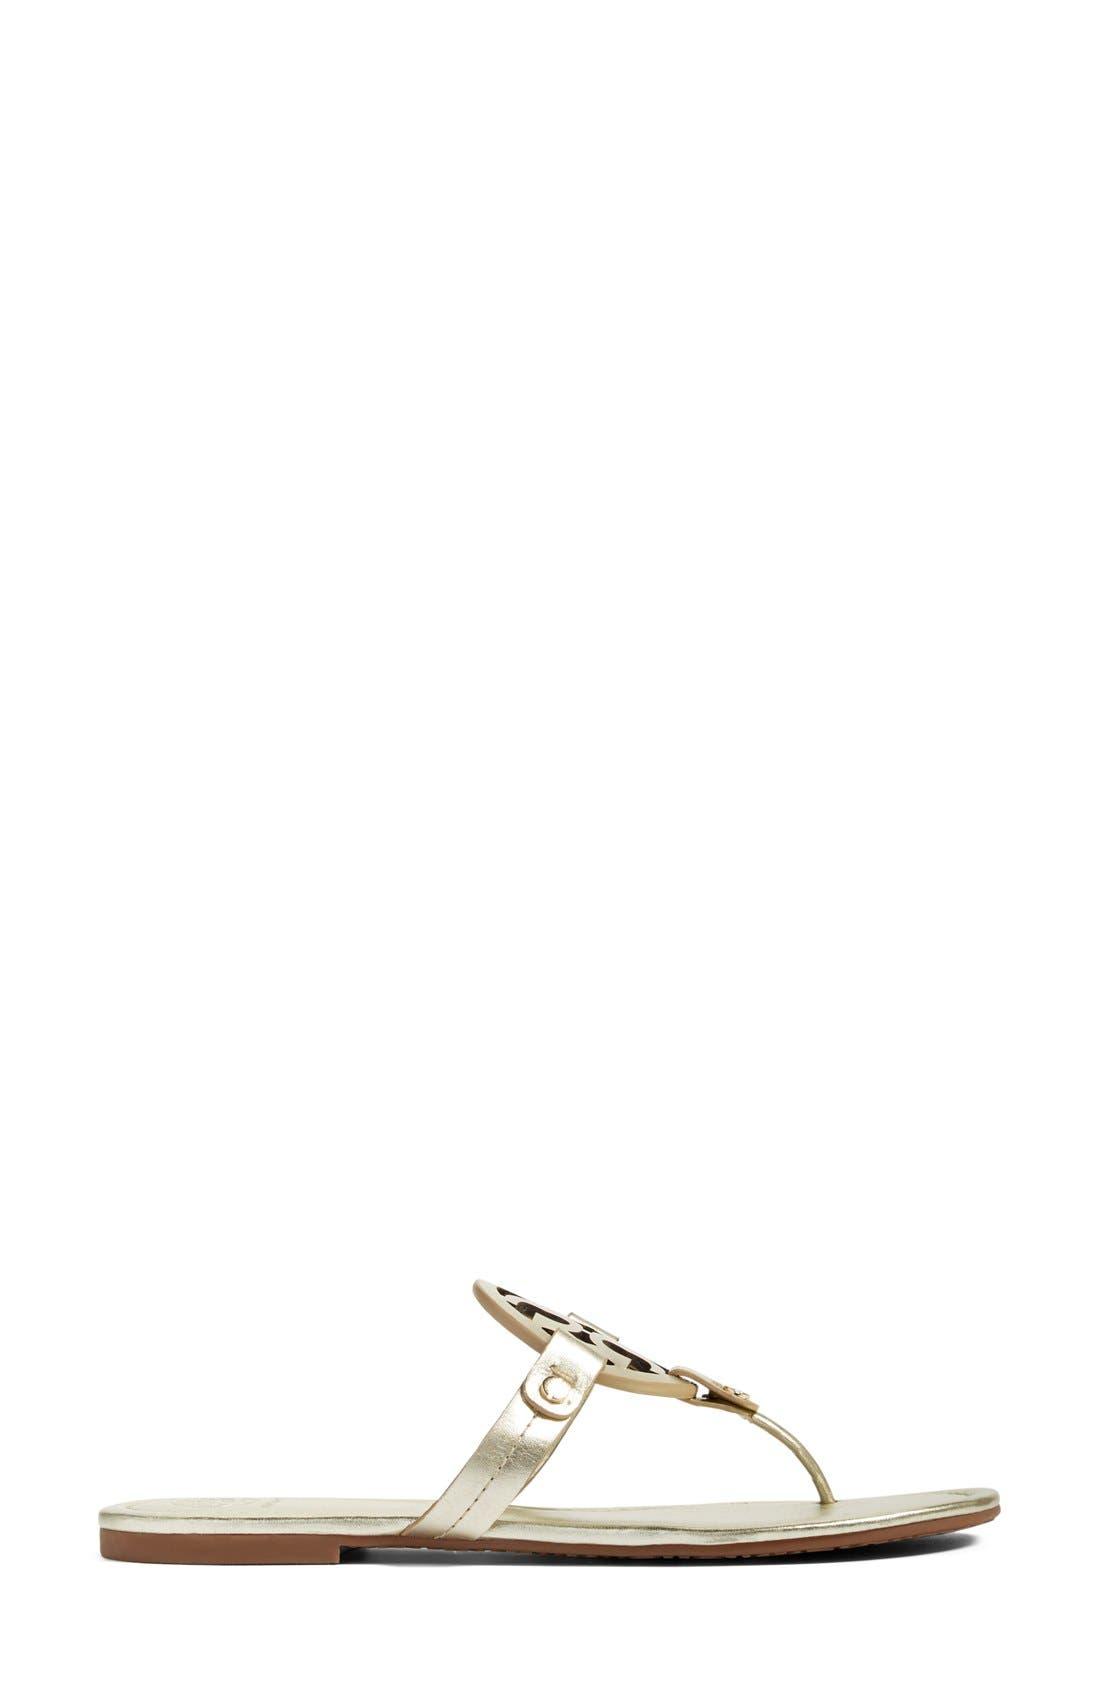 'Miller' Flip Flop,                             Alternate thumbnail 403, color,